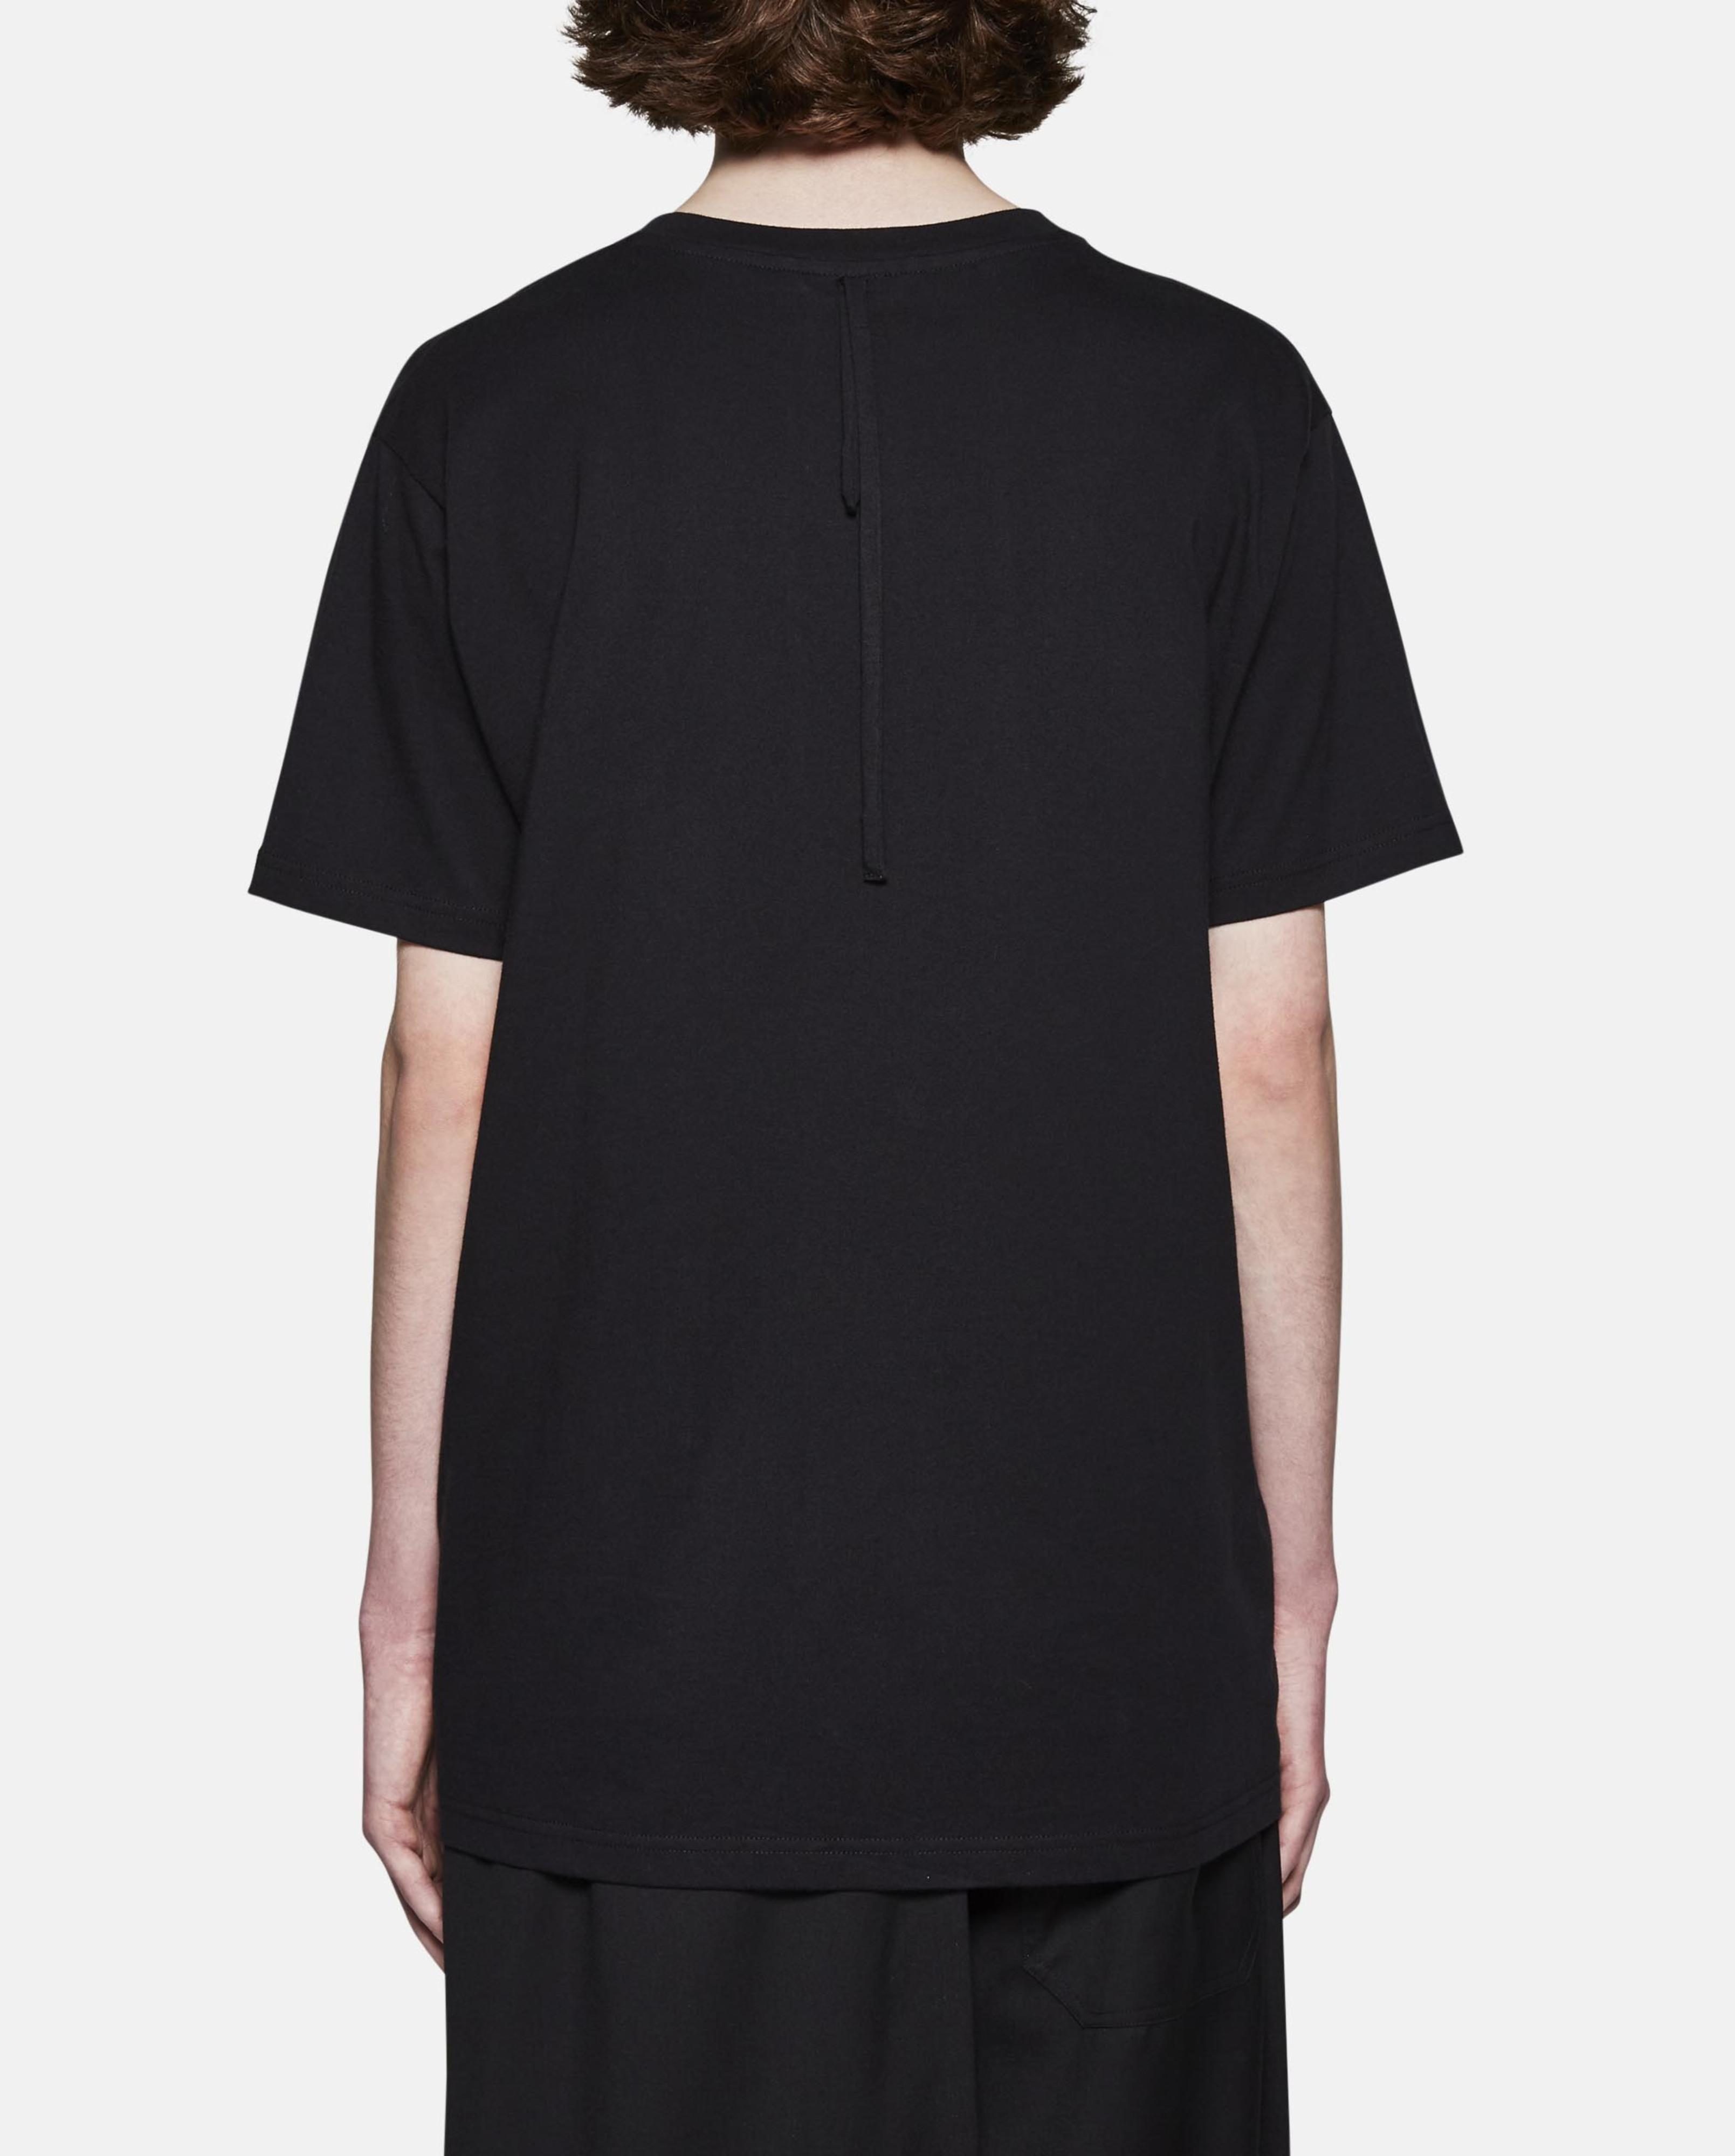 68036f1d3612 Lyst - Craig Green Short Sleeved T-shirt in Black for Men